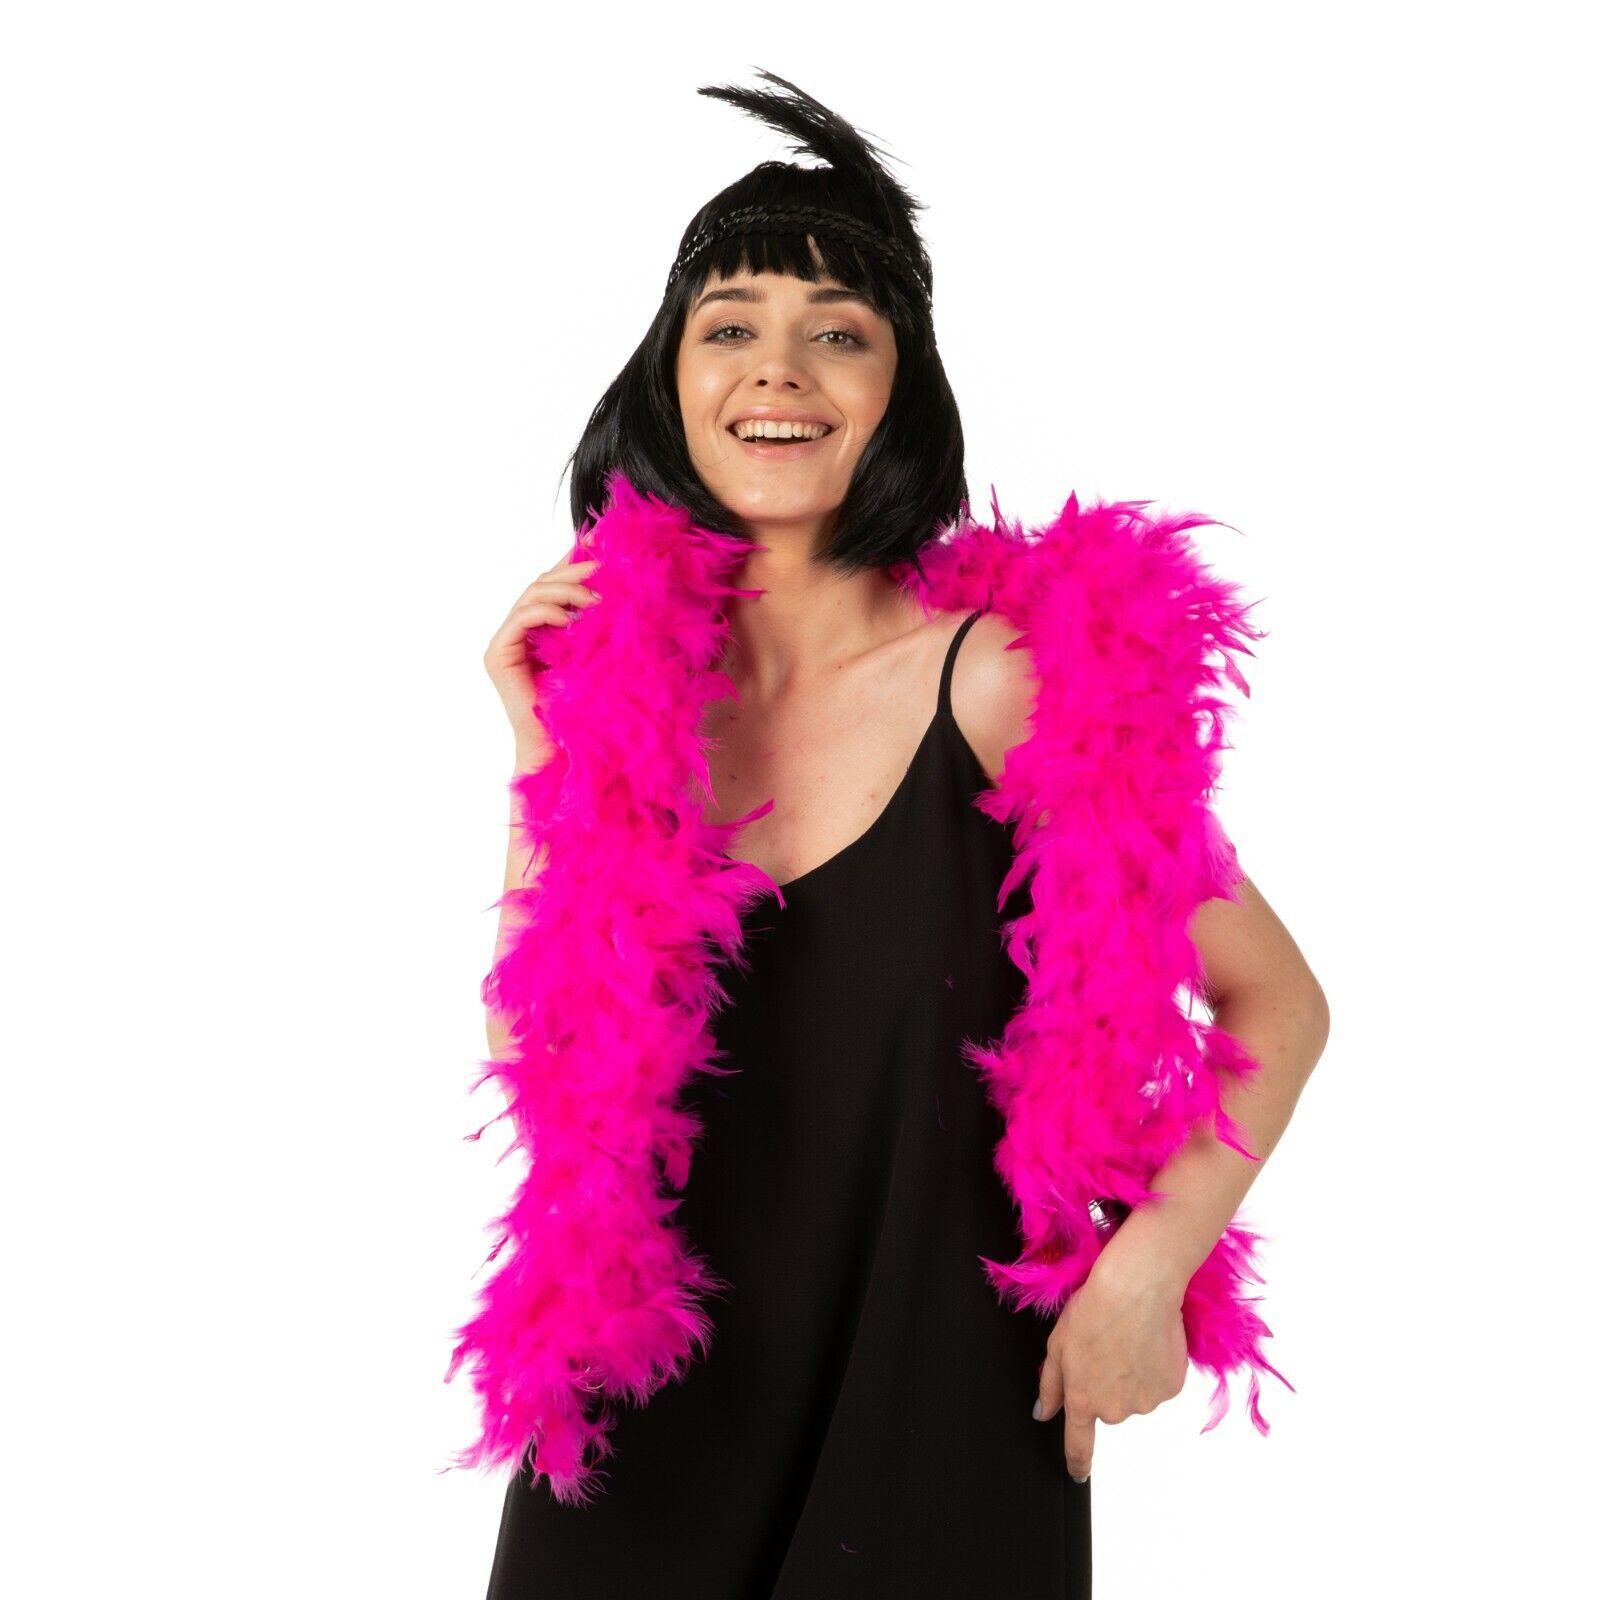 Black Red Feather Boa Garçonne 80 g Saloon Burlesque